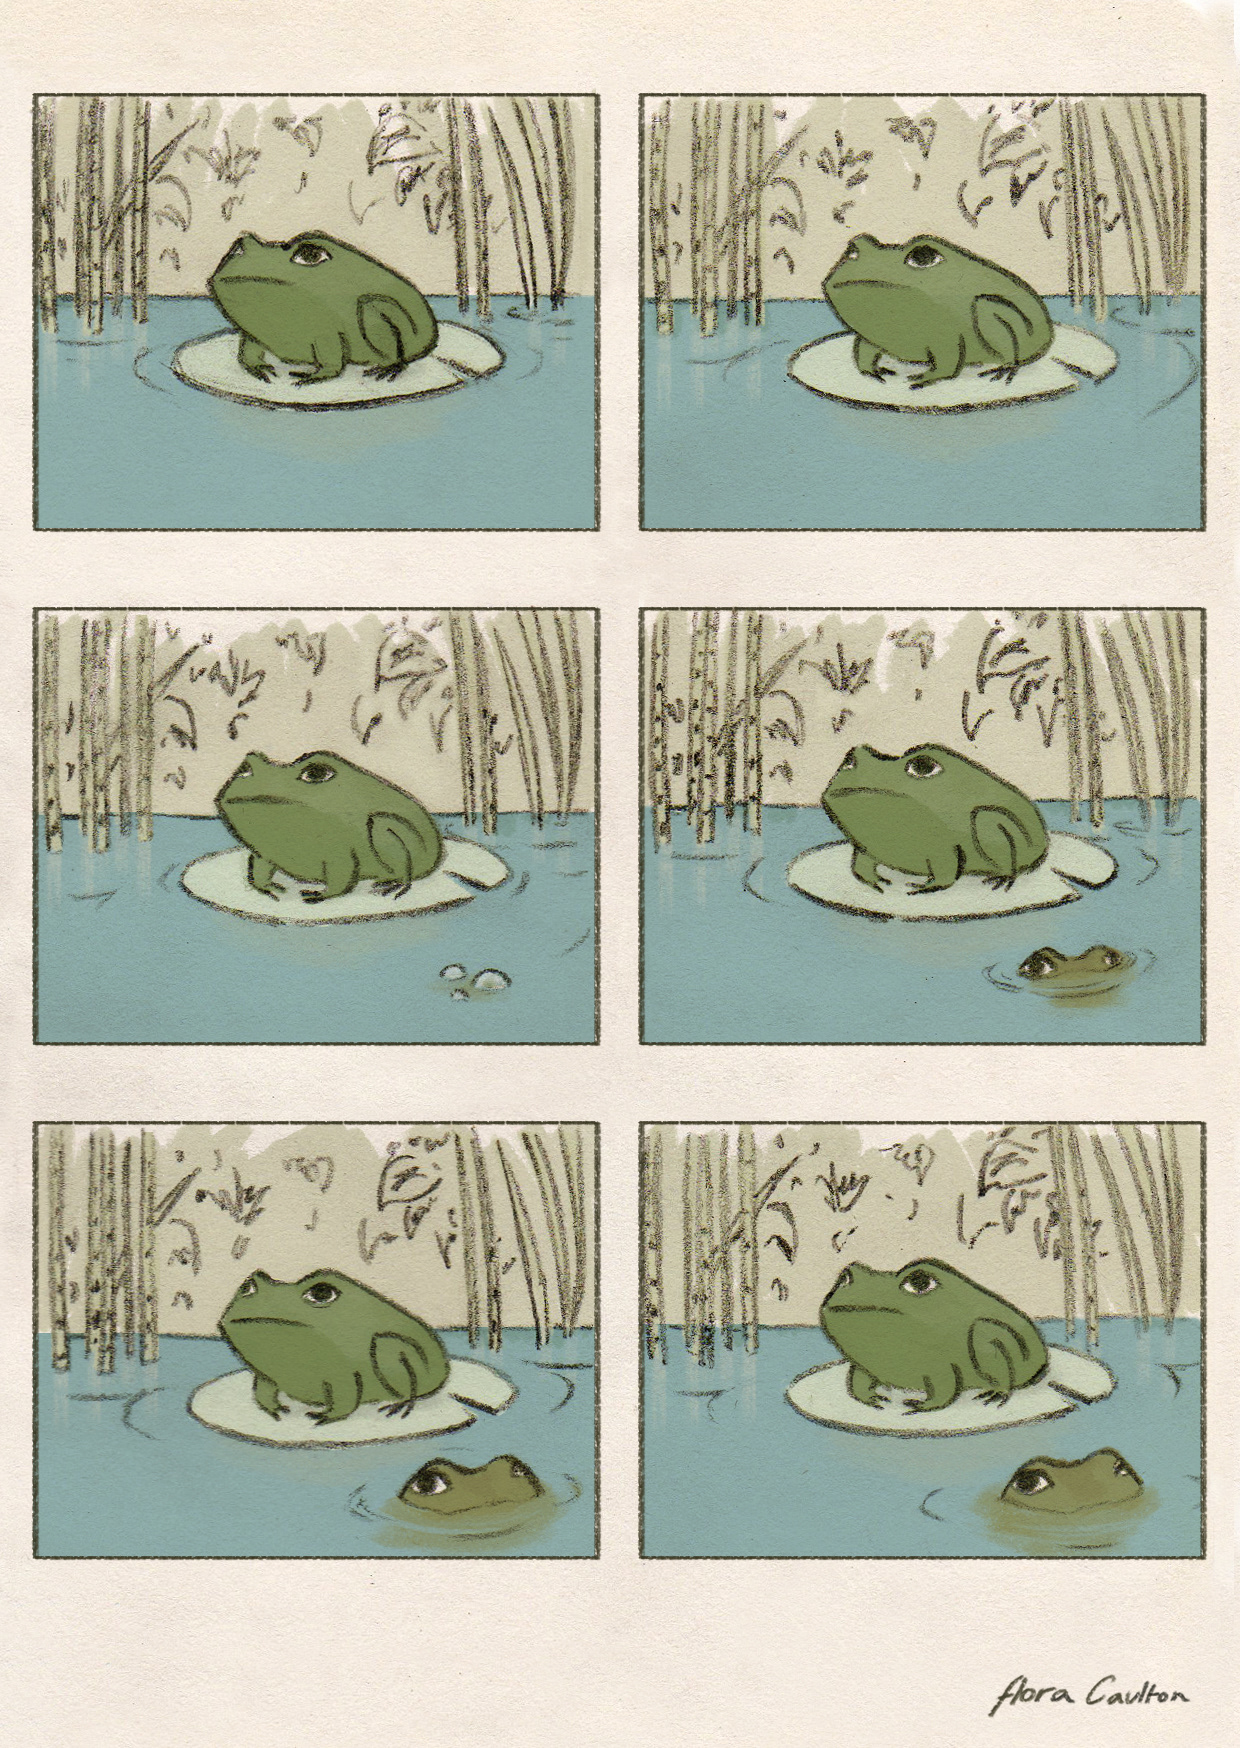 'Pond' - Flora Caulton (2017)